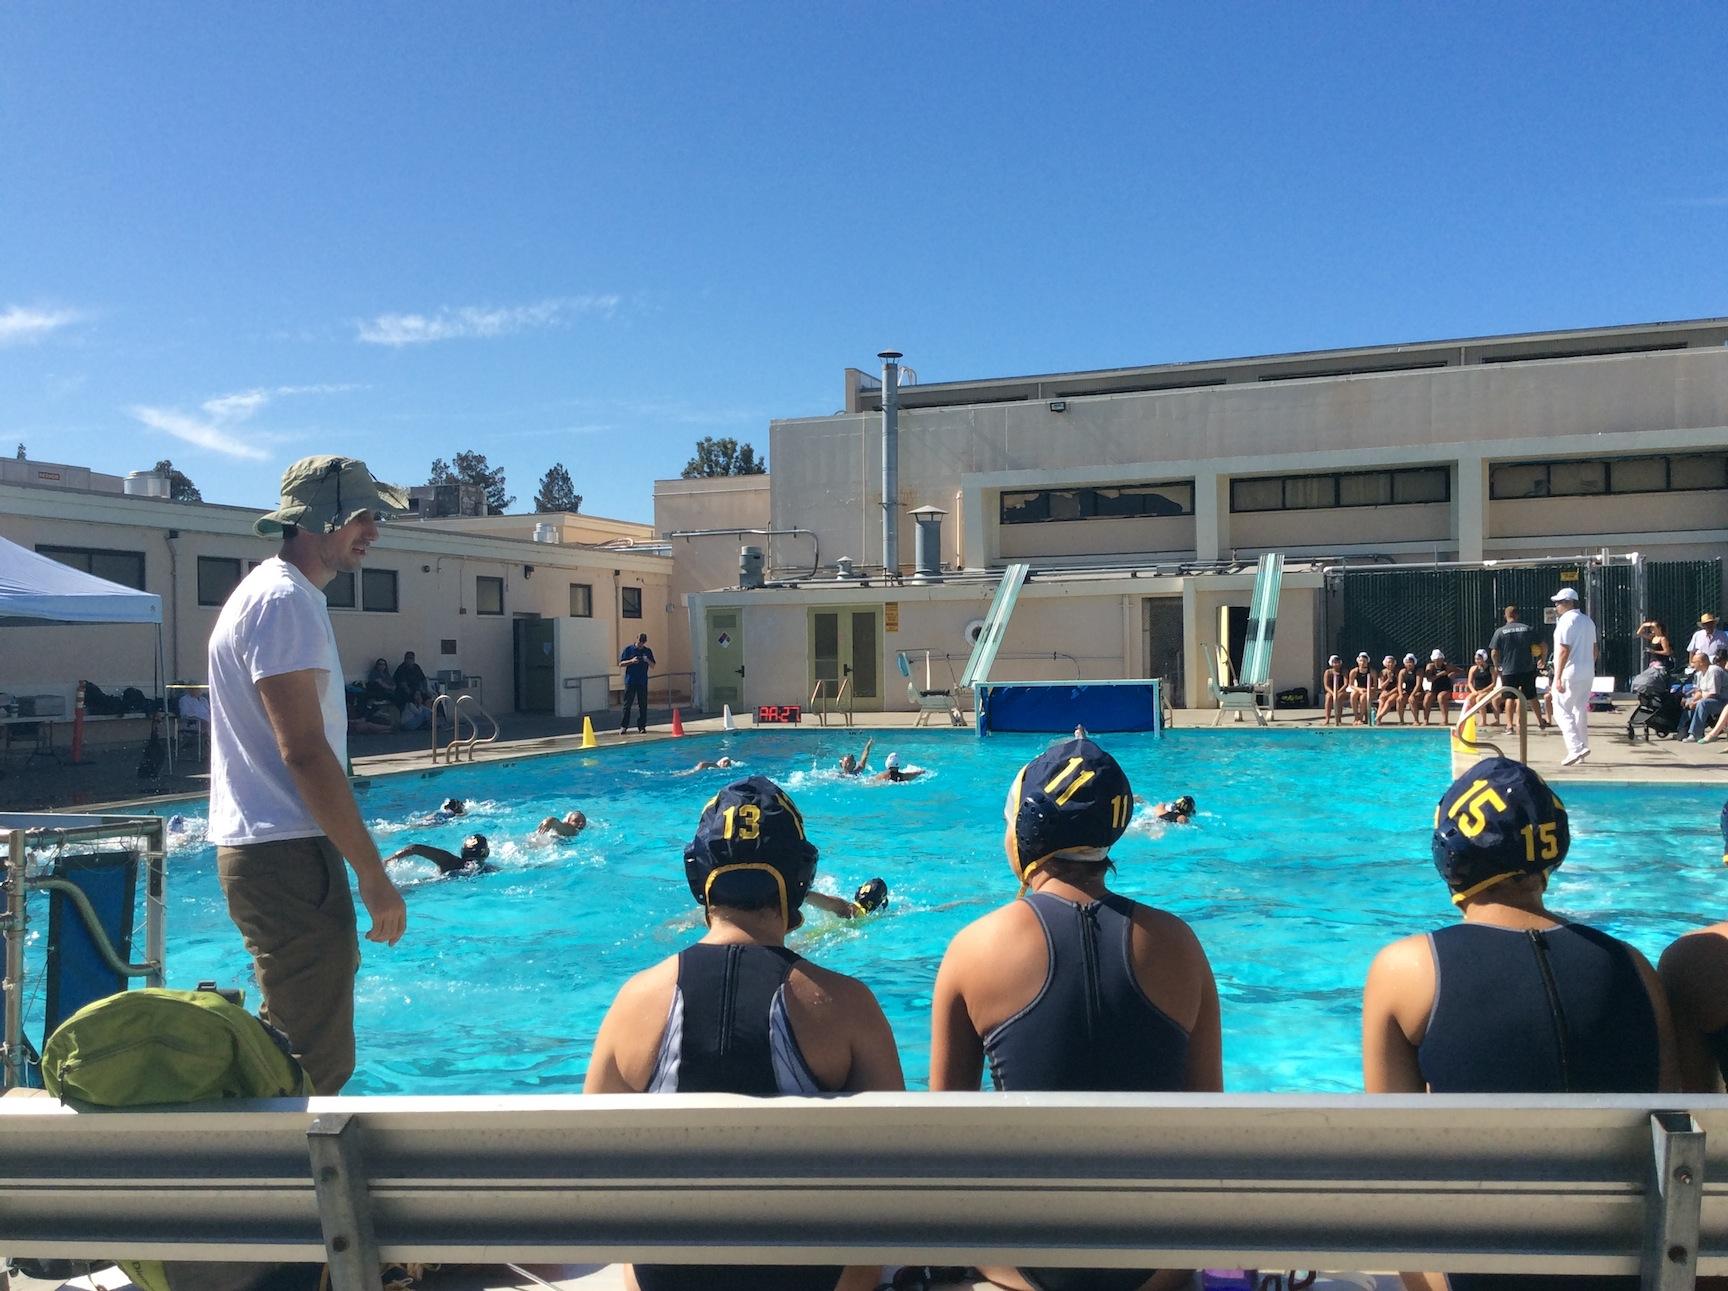 Coach Macko instructing his team. (Alicia Gomez/ Lincoln Lion Tales)